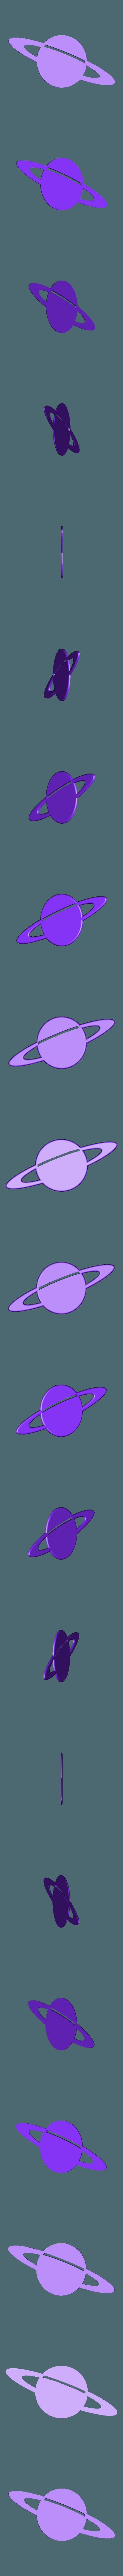 Space Decals_ Saturn.stl Download free STL file Space Decals • 3D printing template, Hom3d